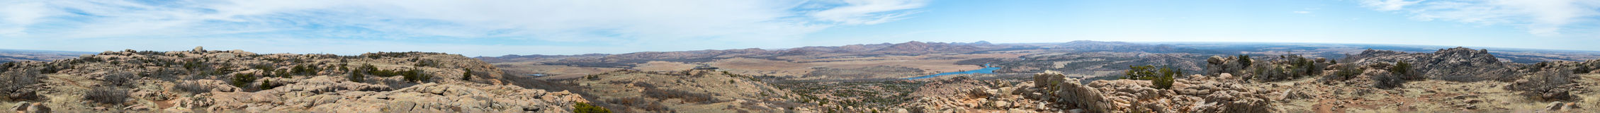 Panorama de sommet de montagne Images stock